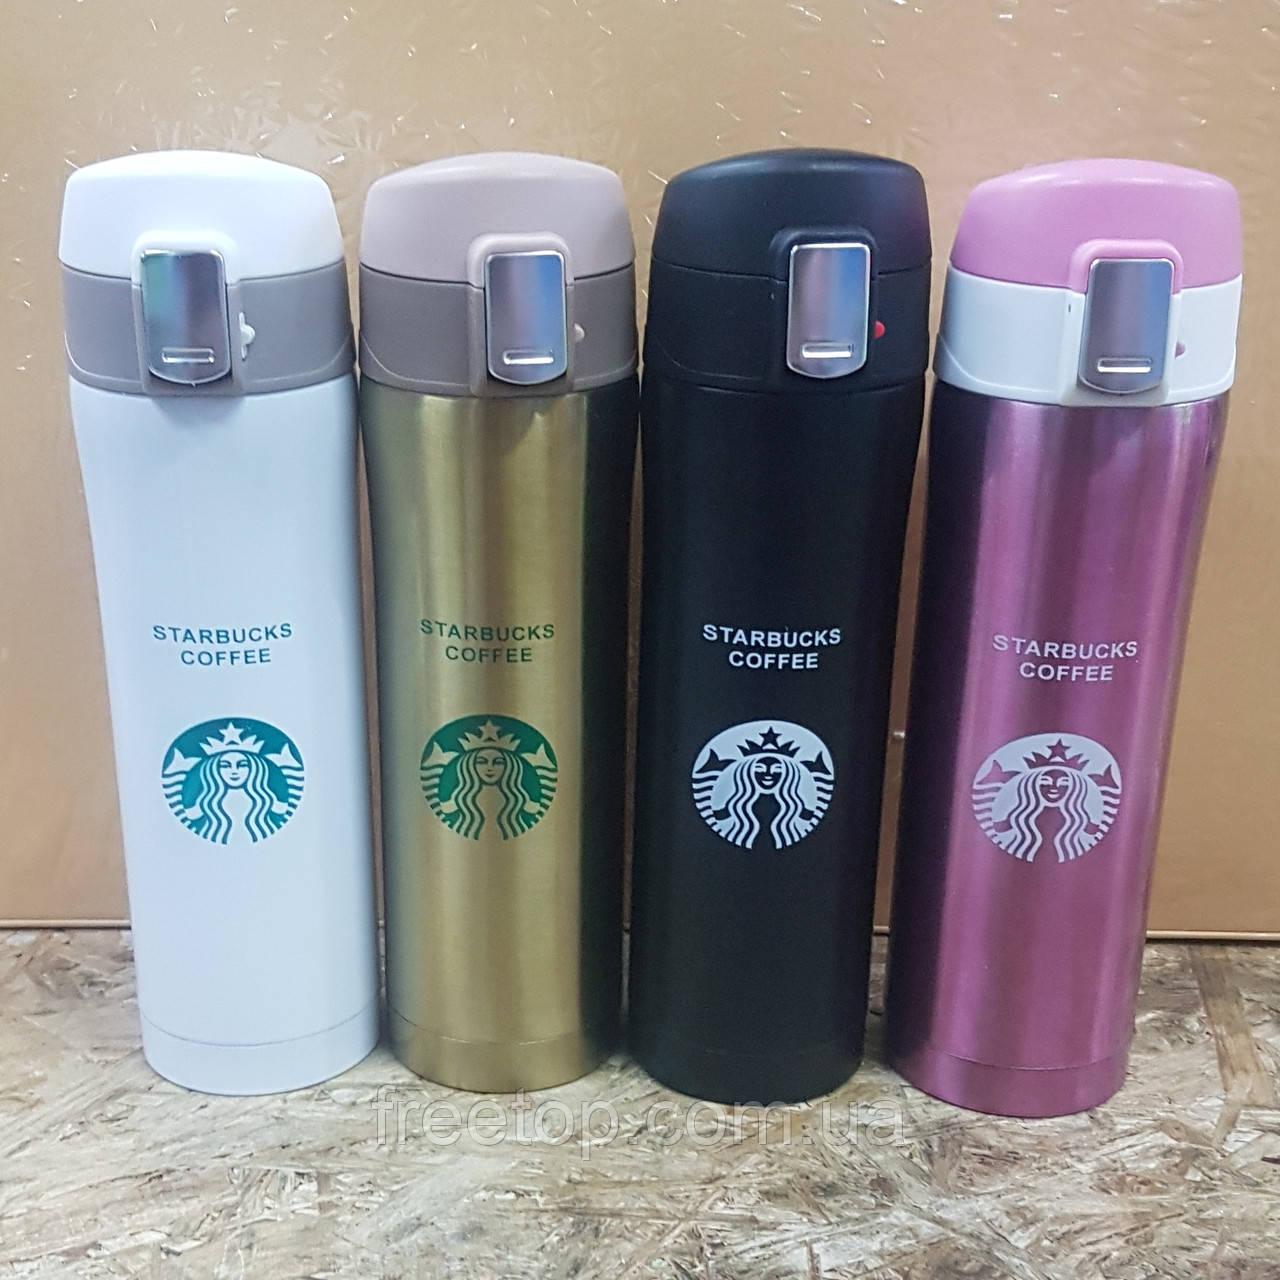 Starbucks koffee Старбакс кофе термос 480 мл